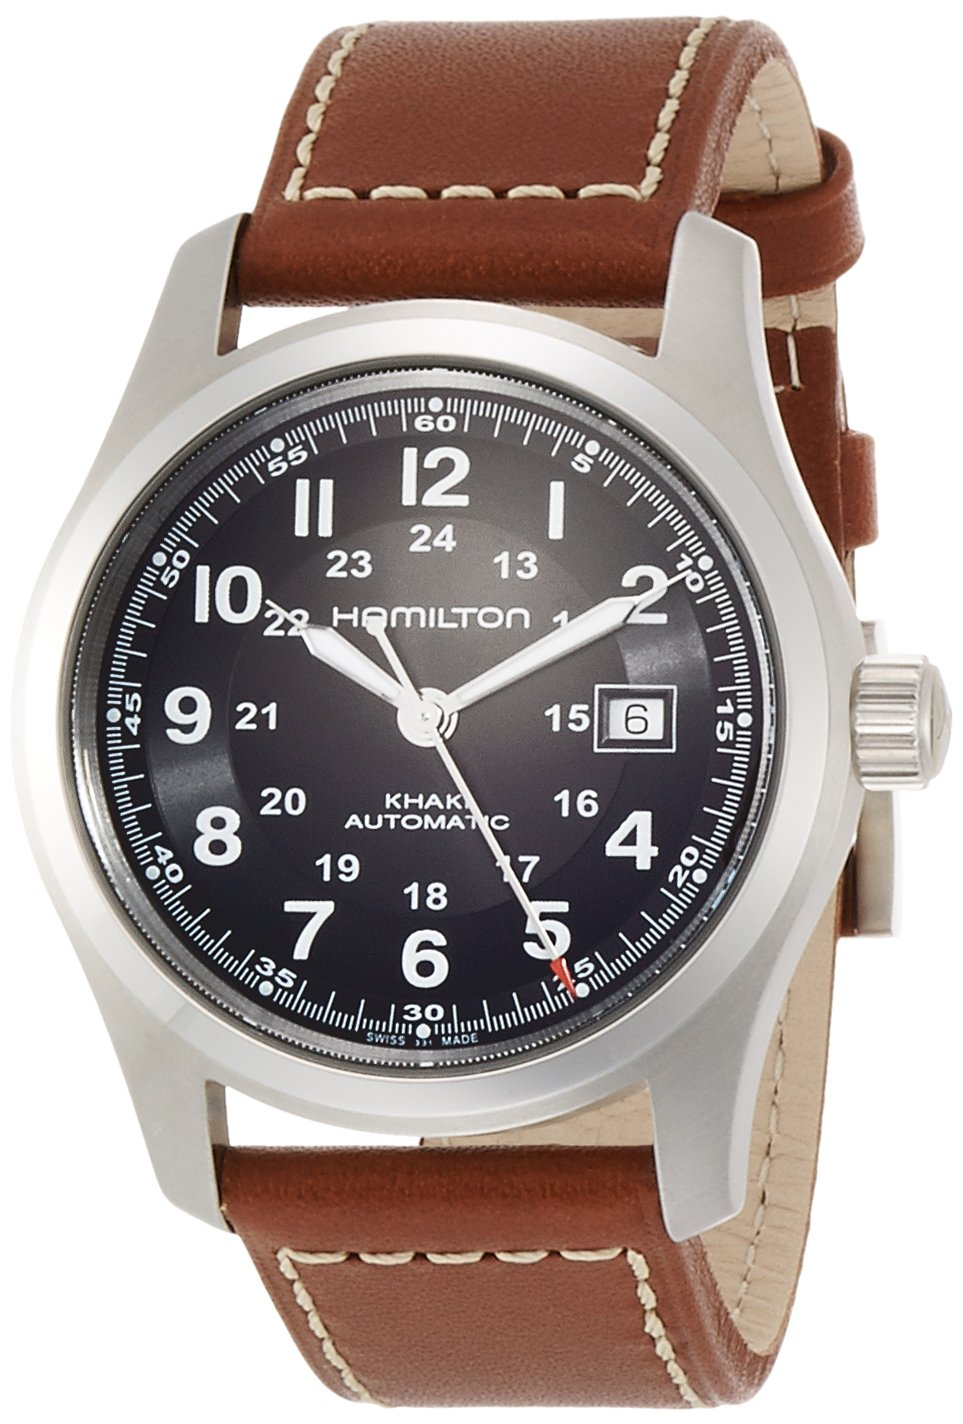 Hamilton – Men's Watch H70555533